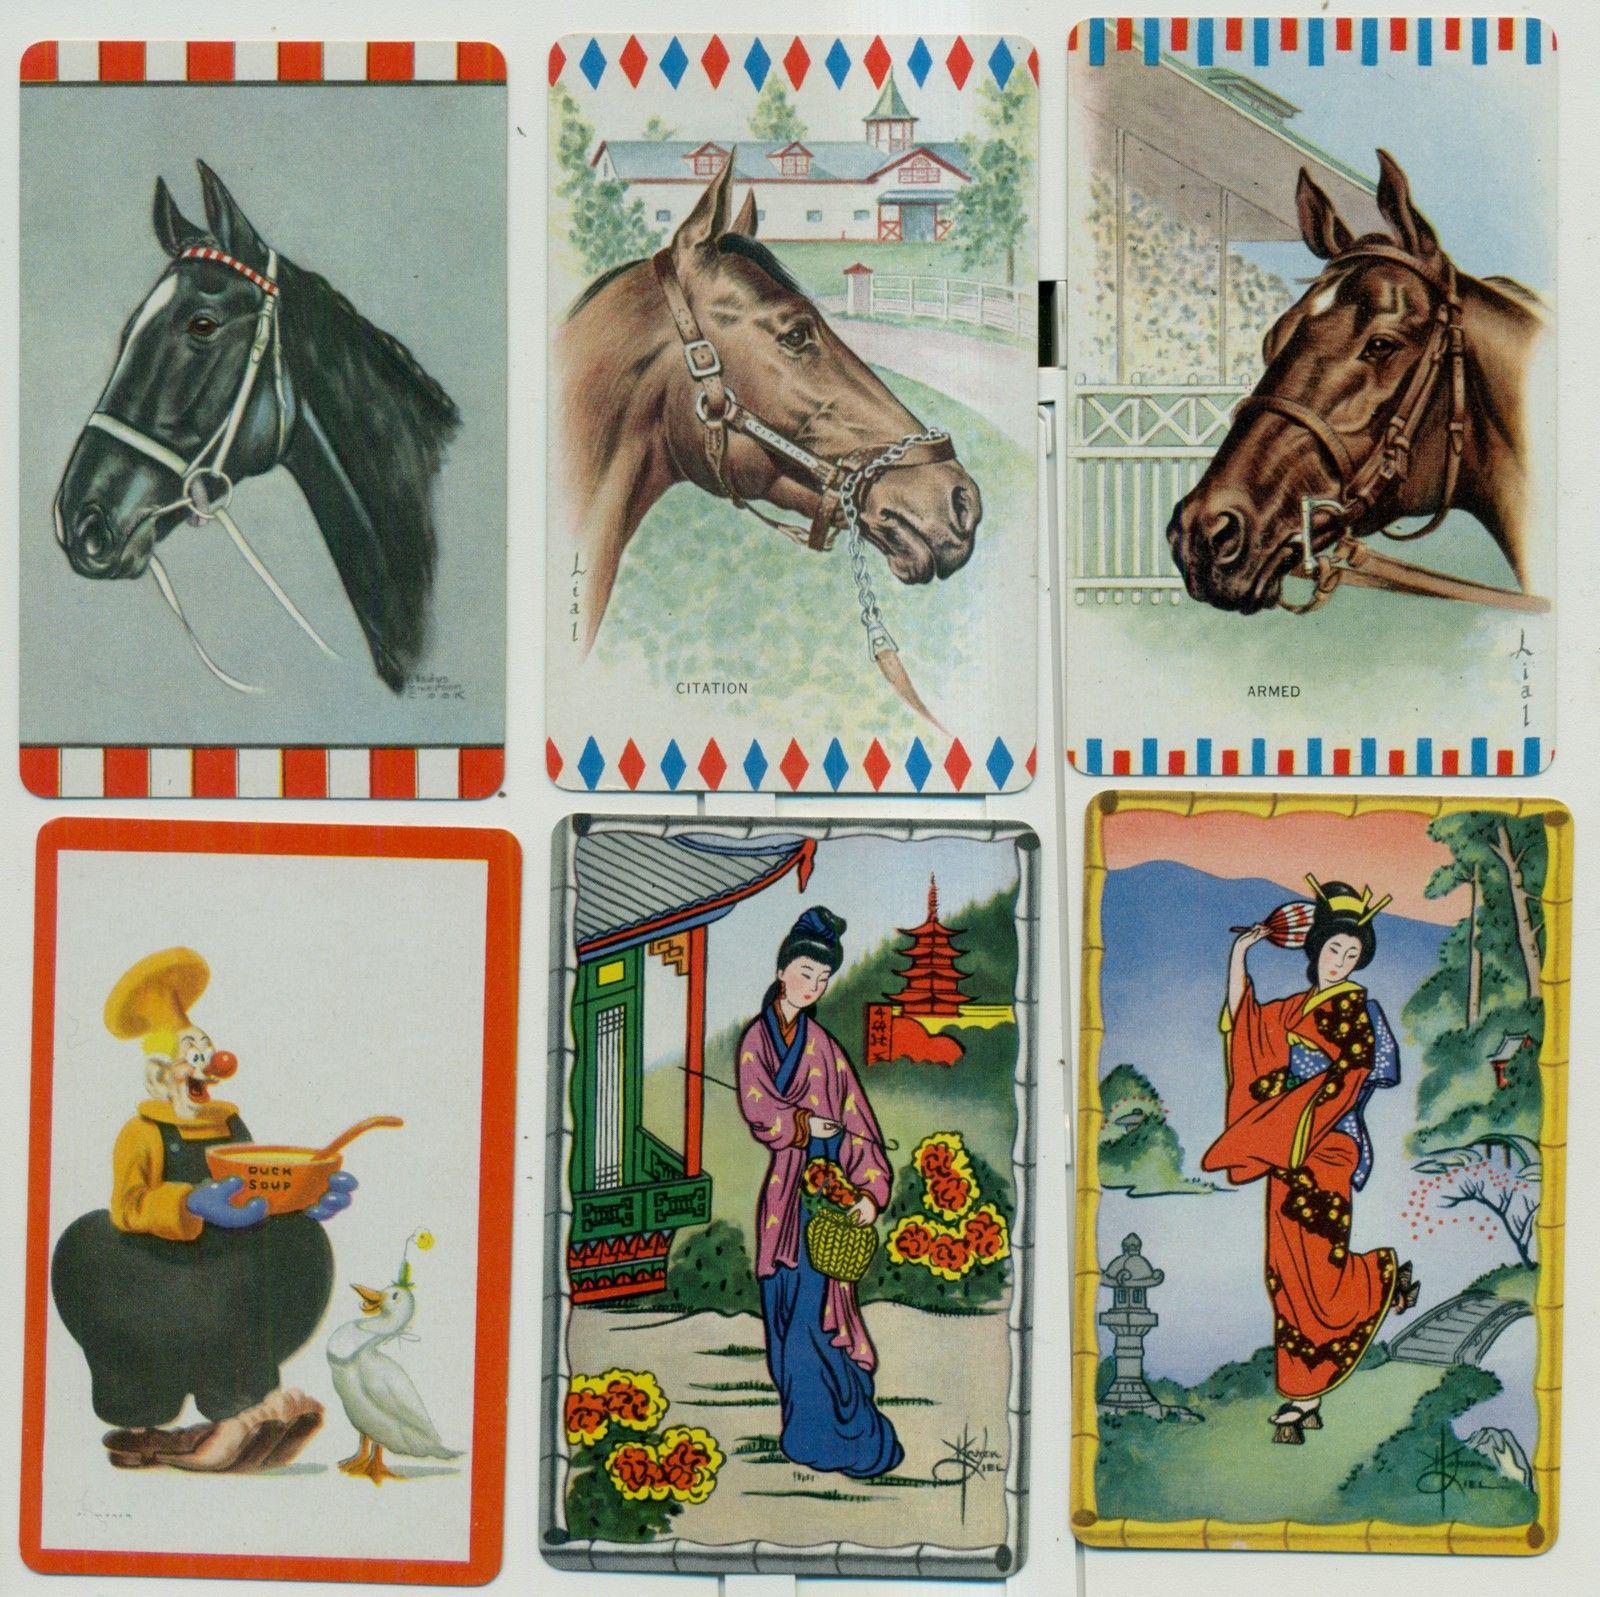 Arrco cards